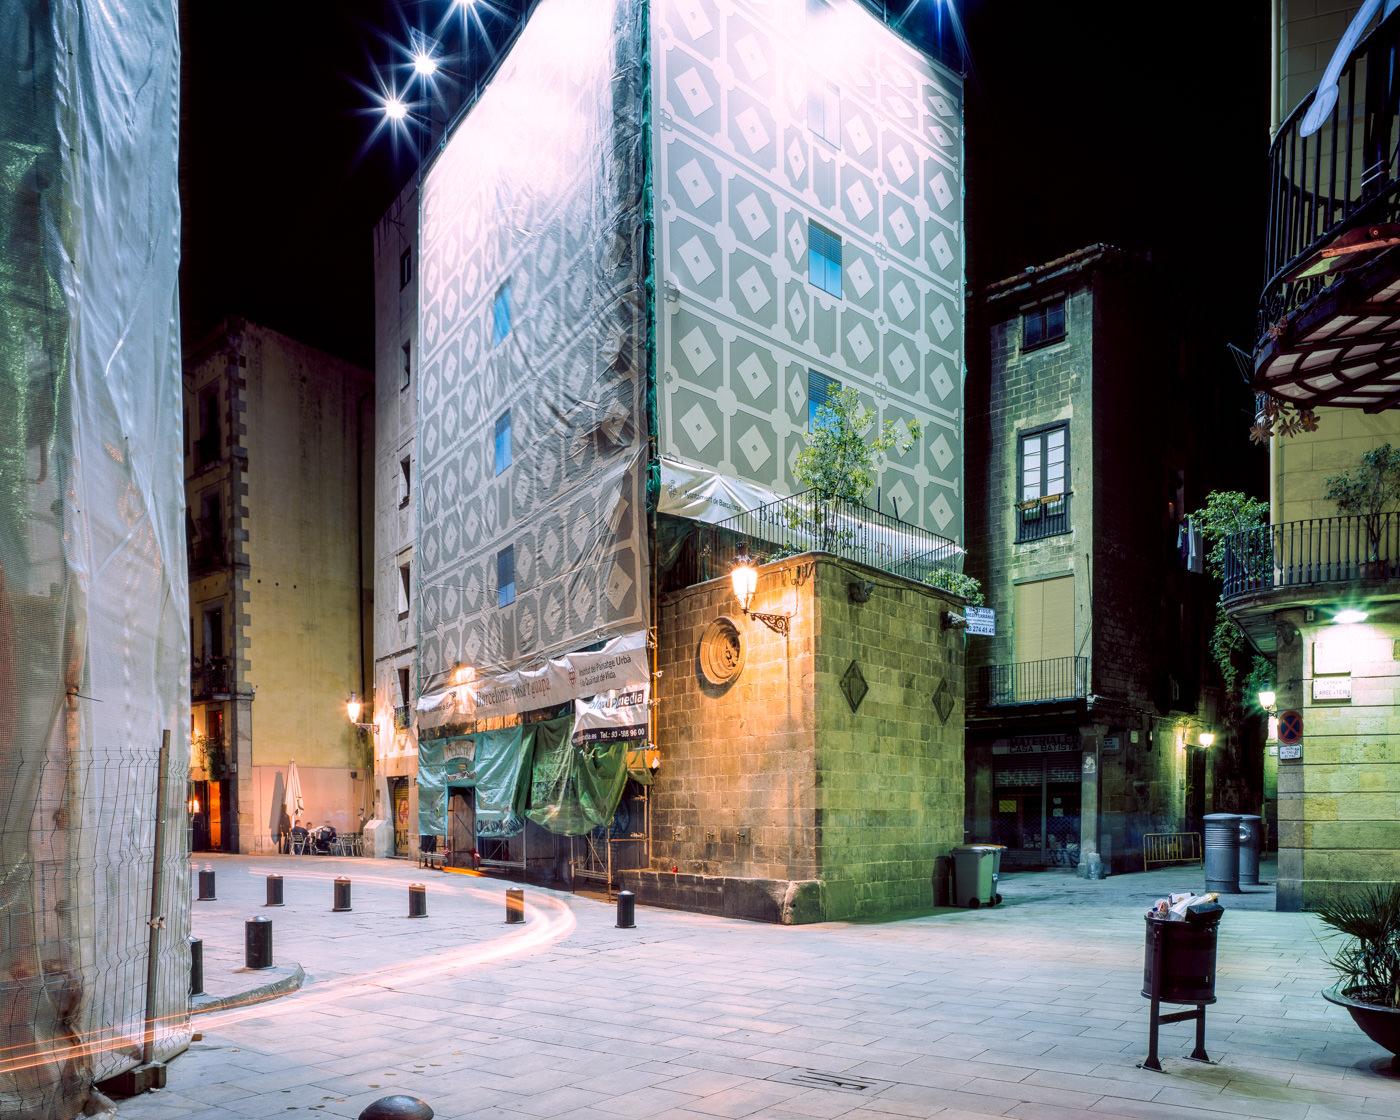 """Plaça de Santa Maria, Barcelona"" from the series Nylon Chrysalis, by William Mokrynski"